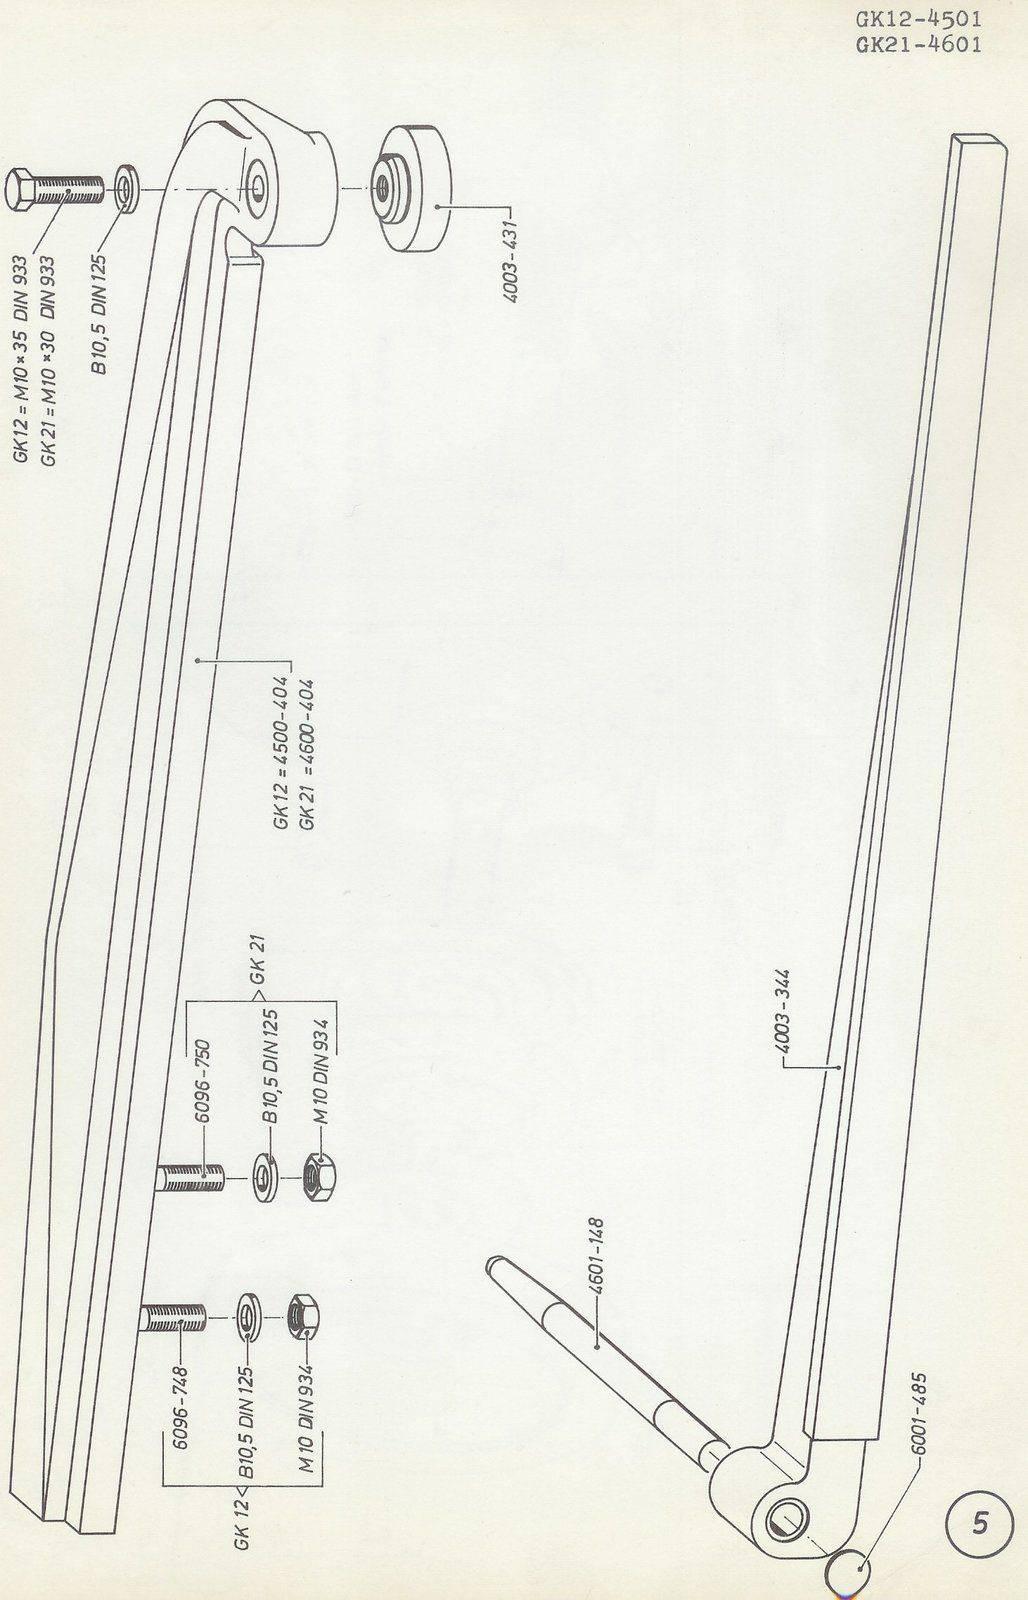 Deckel GK12-21 Parts Catalogue 1975 p5.jpg